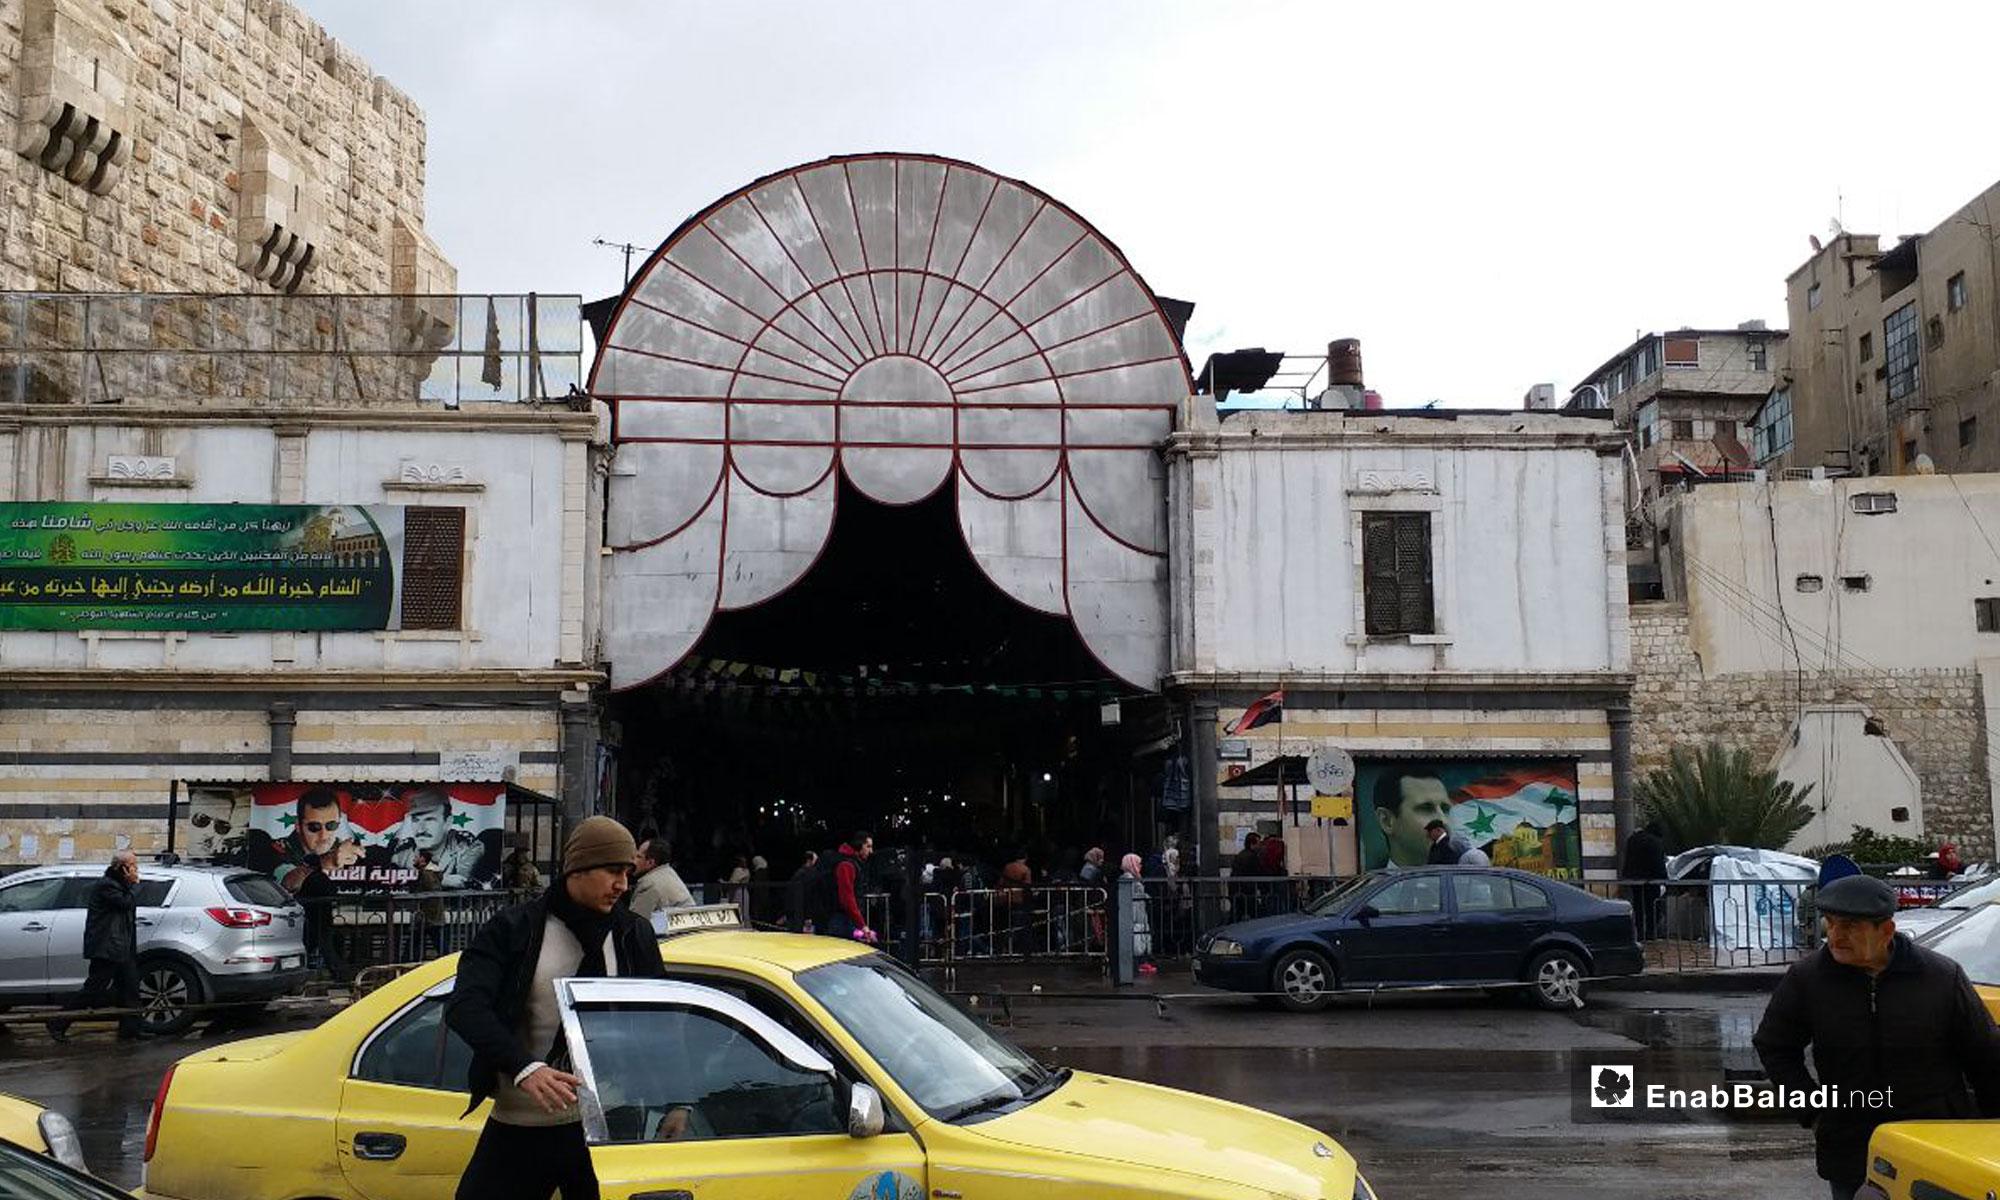 Al-Hamidiyah Market, Damascus - January 12, 2019 (Enab Baladi)